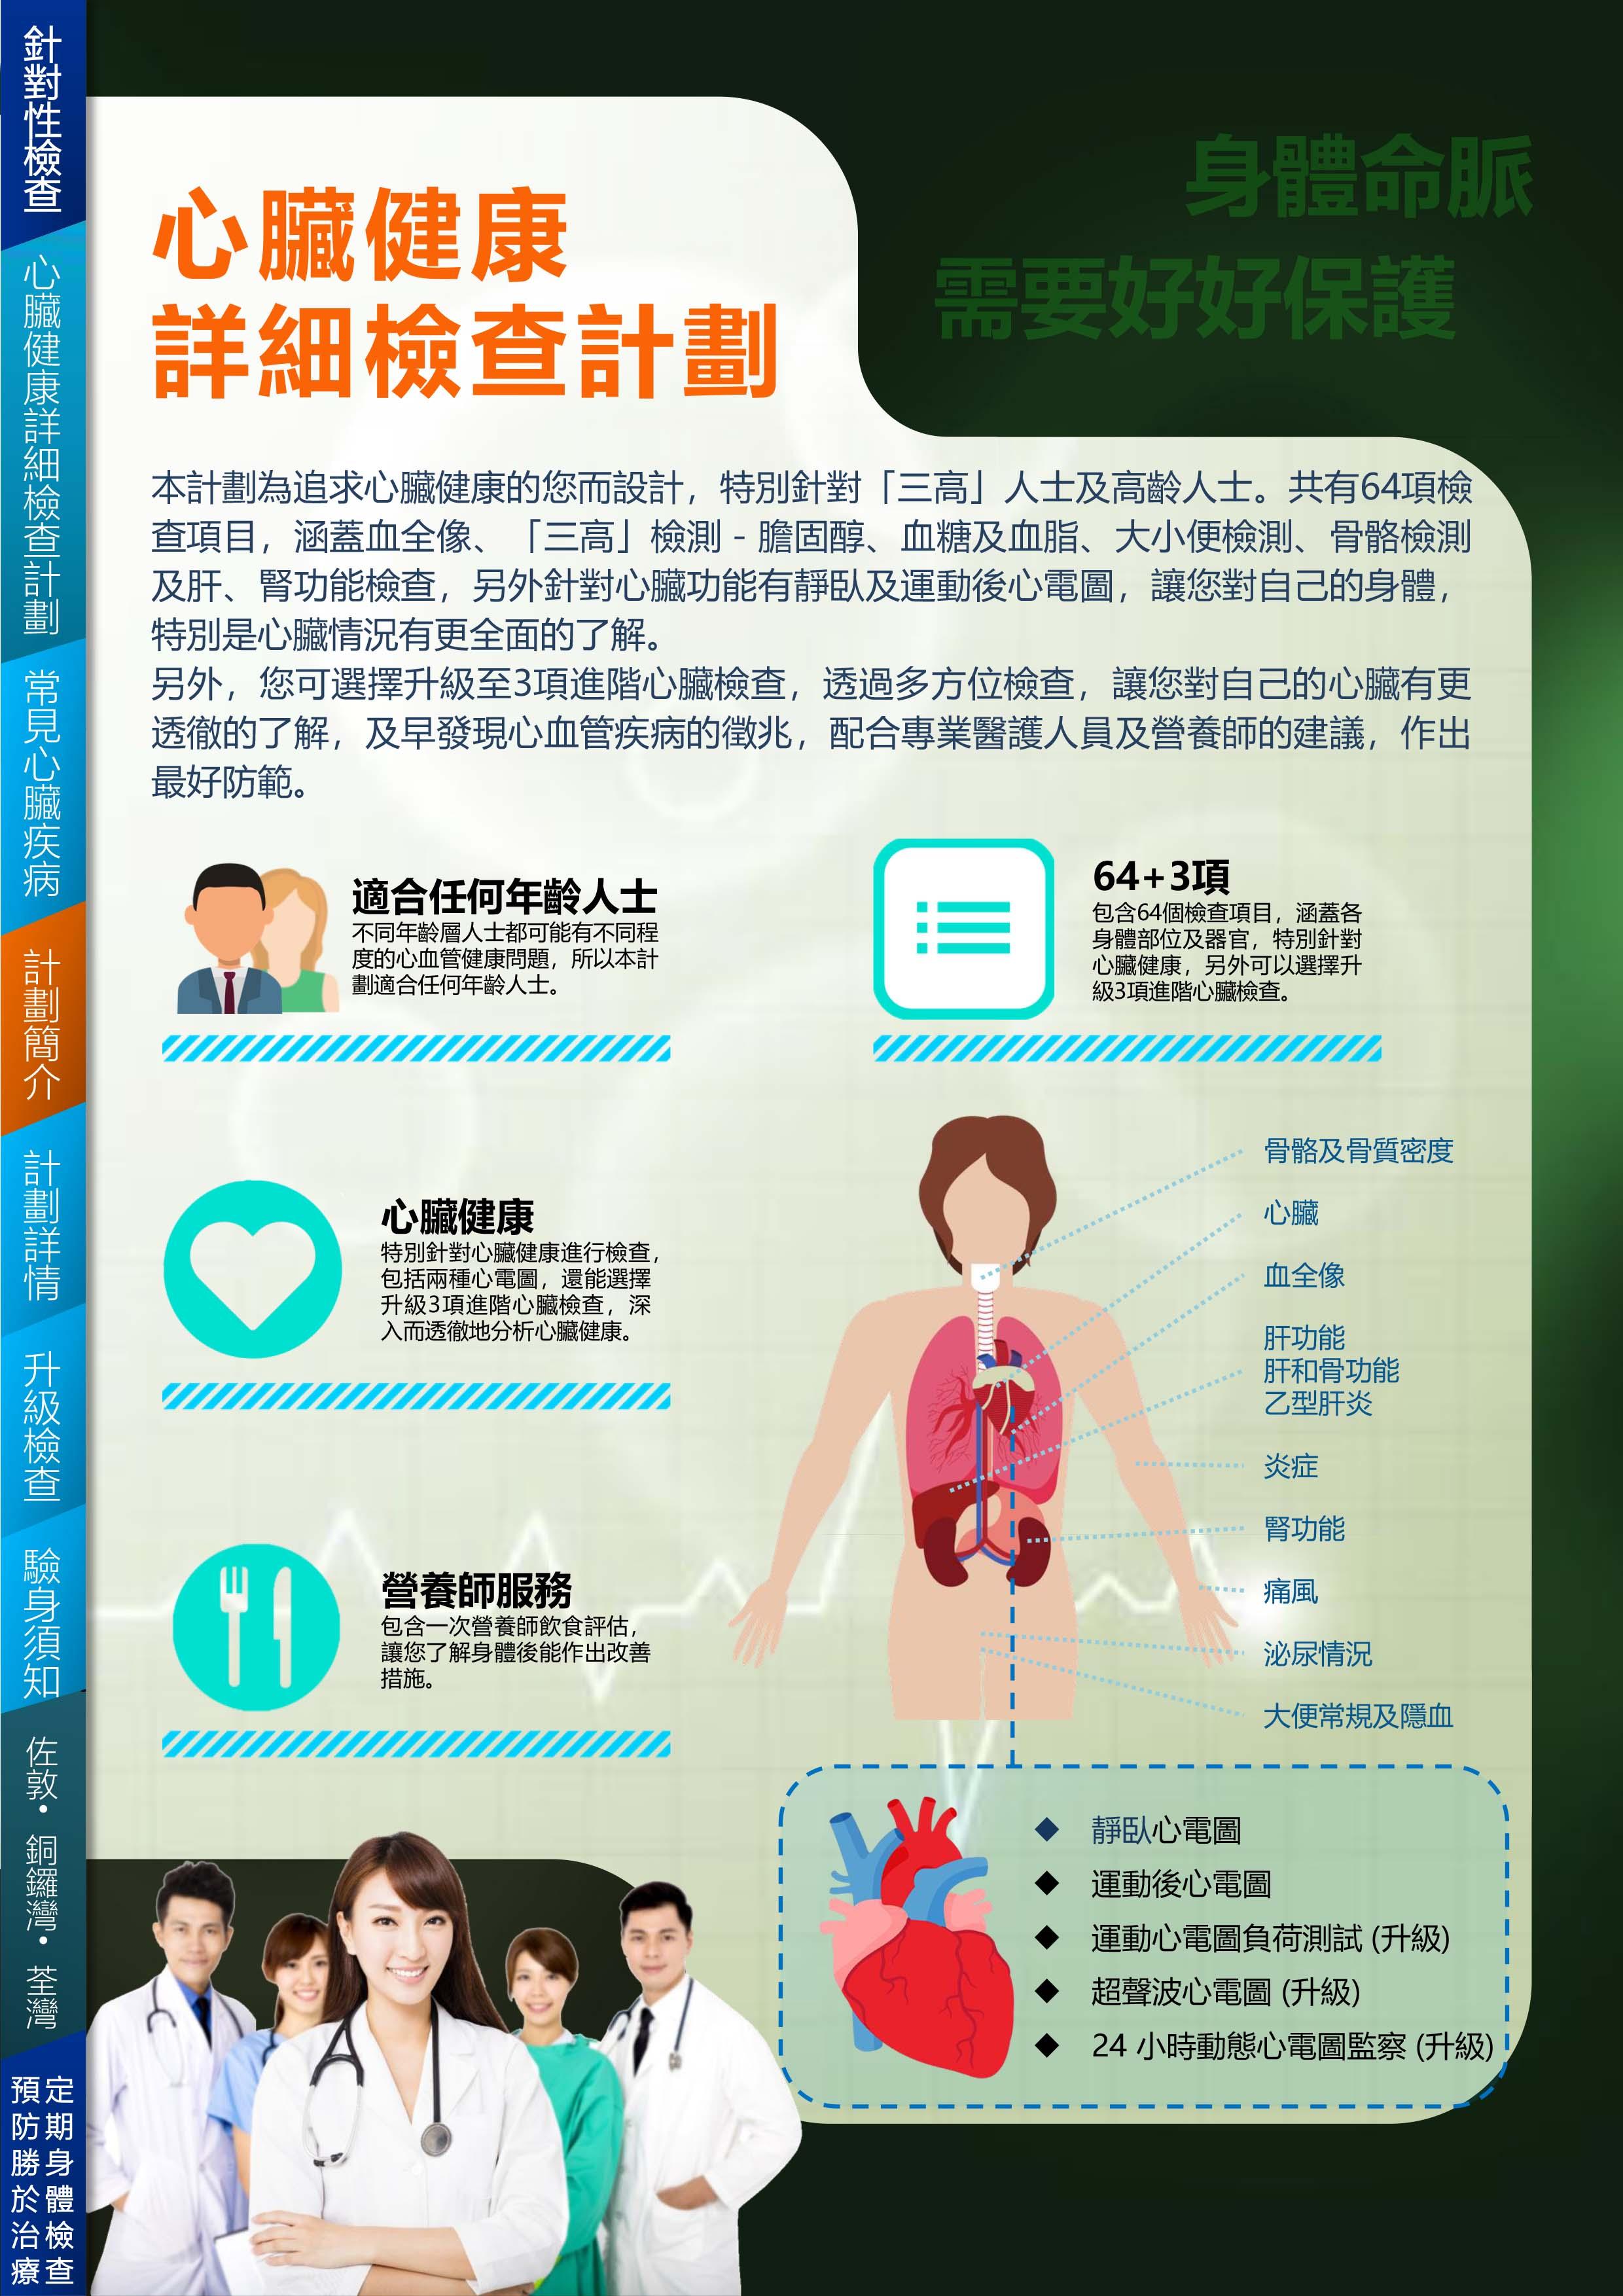 2e-heart-blood-health-check-3.jpg